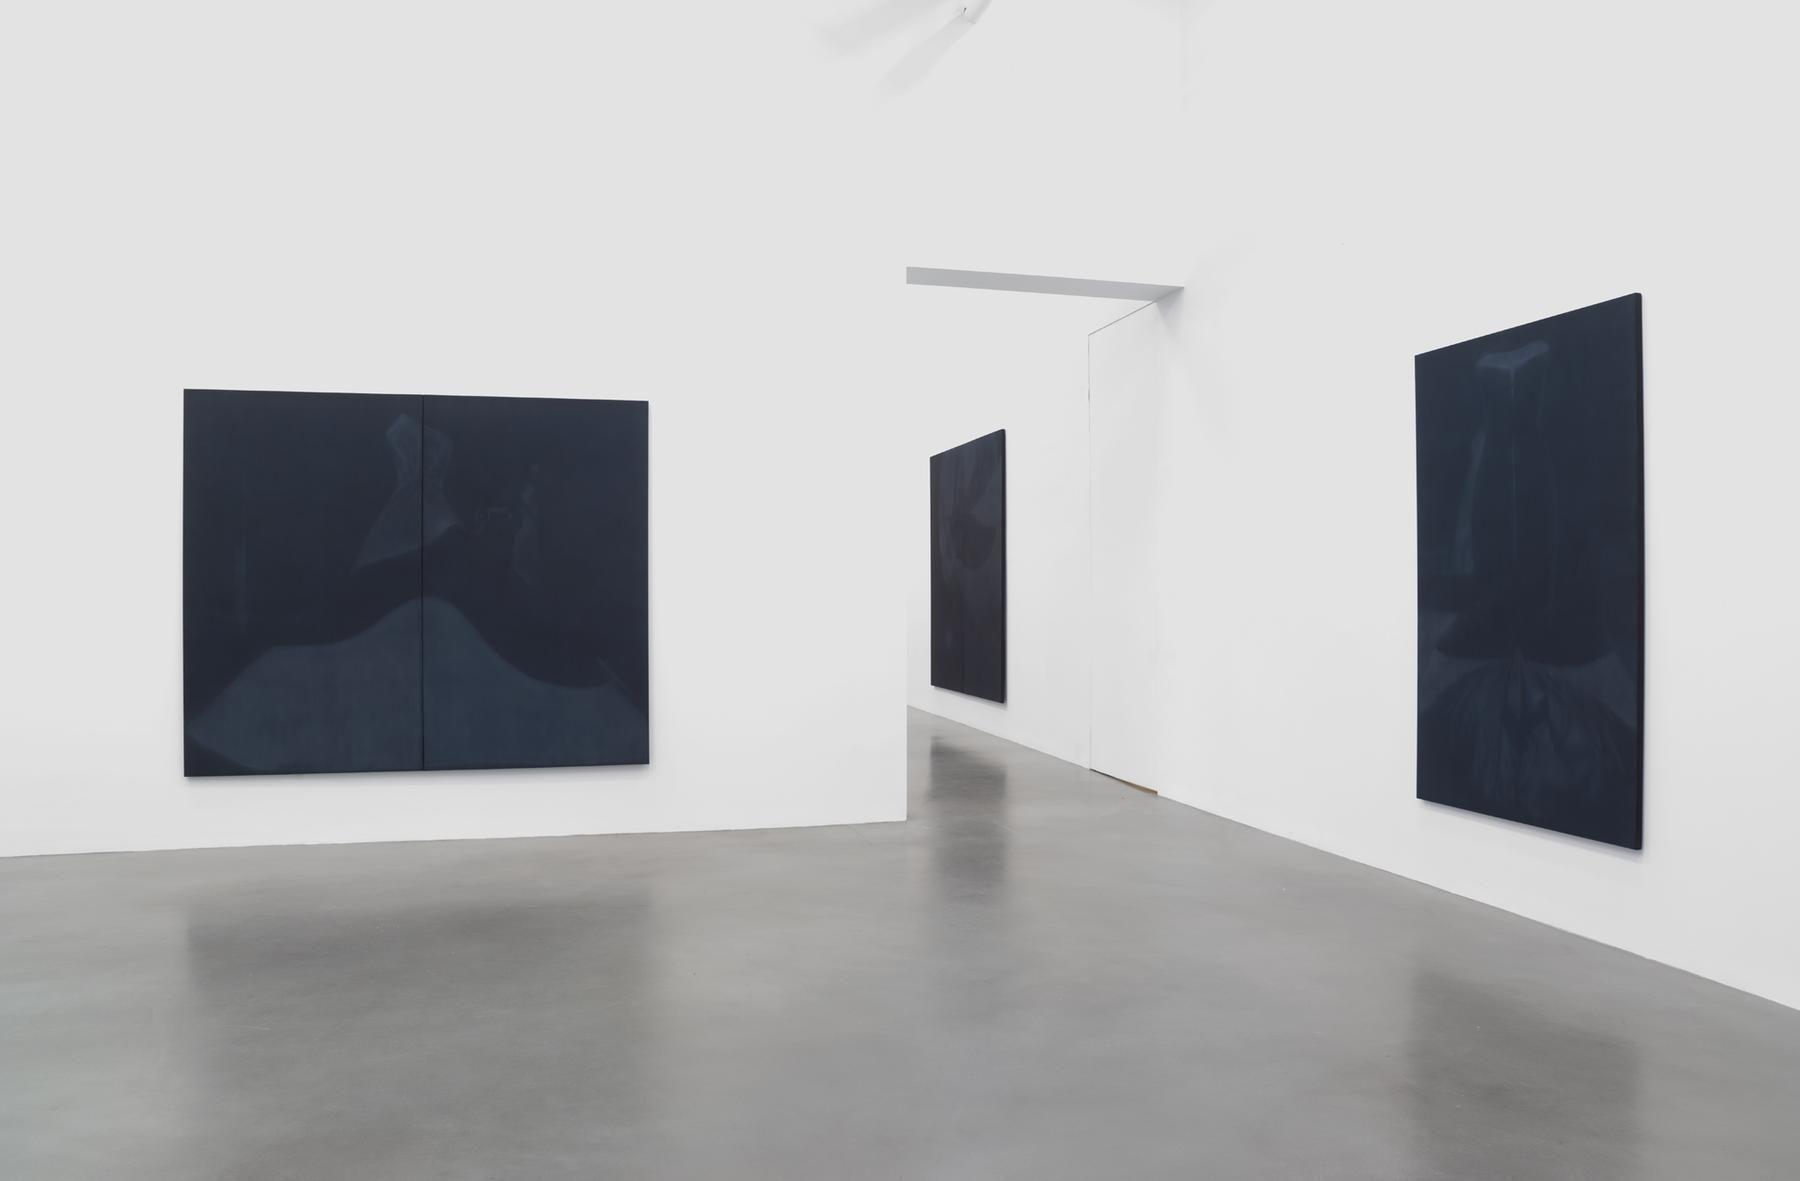 Troy Brauntuch Installation view 6